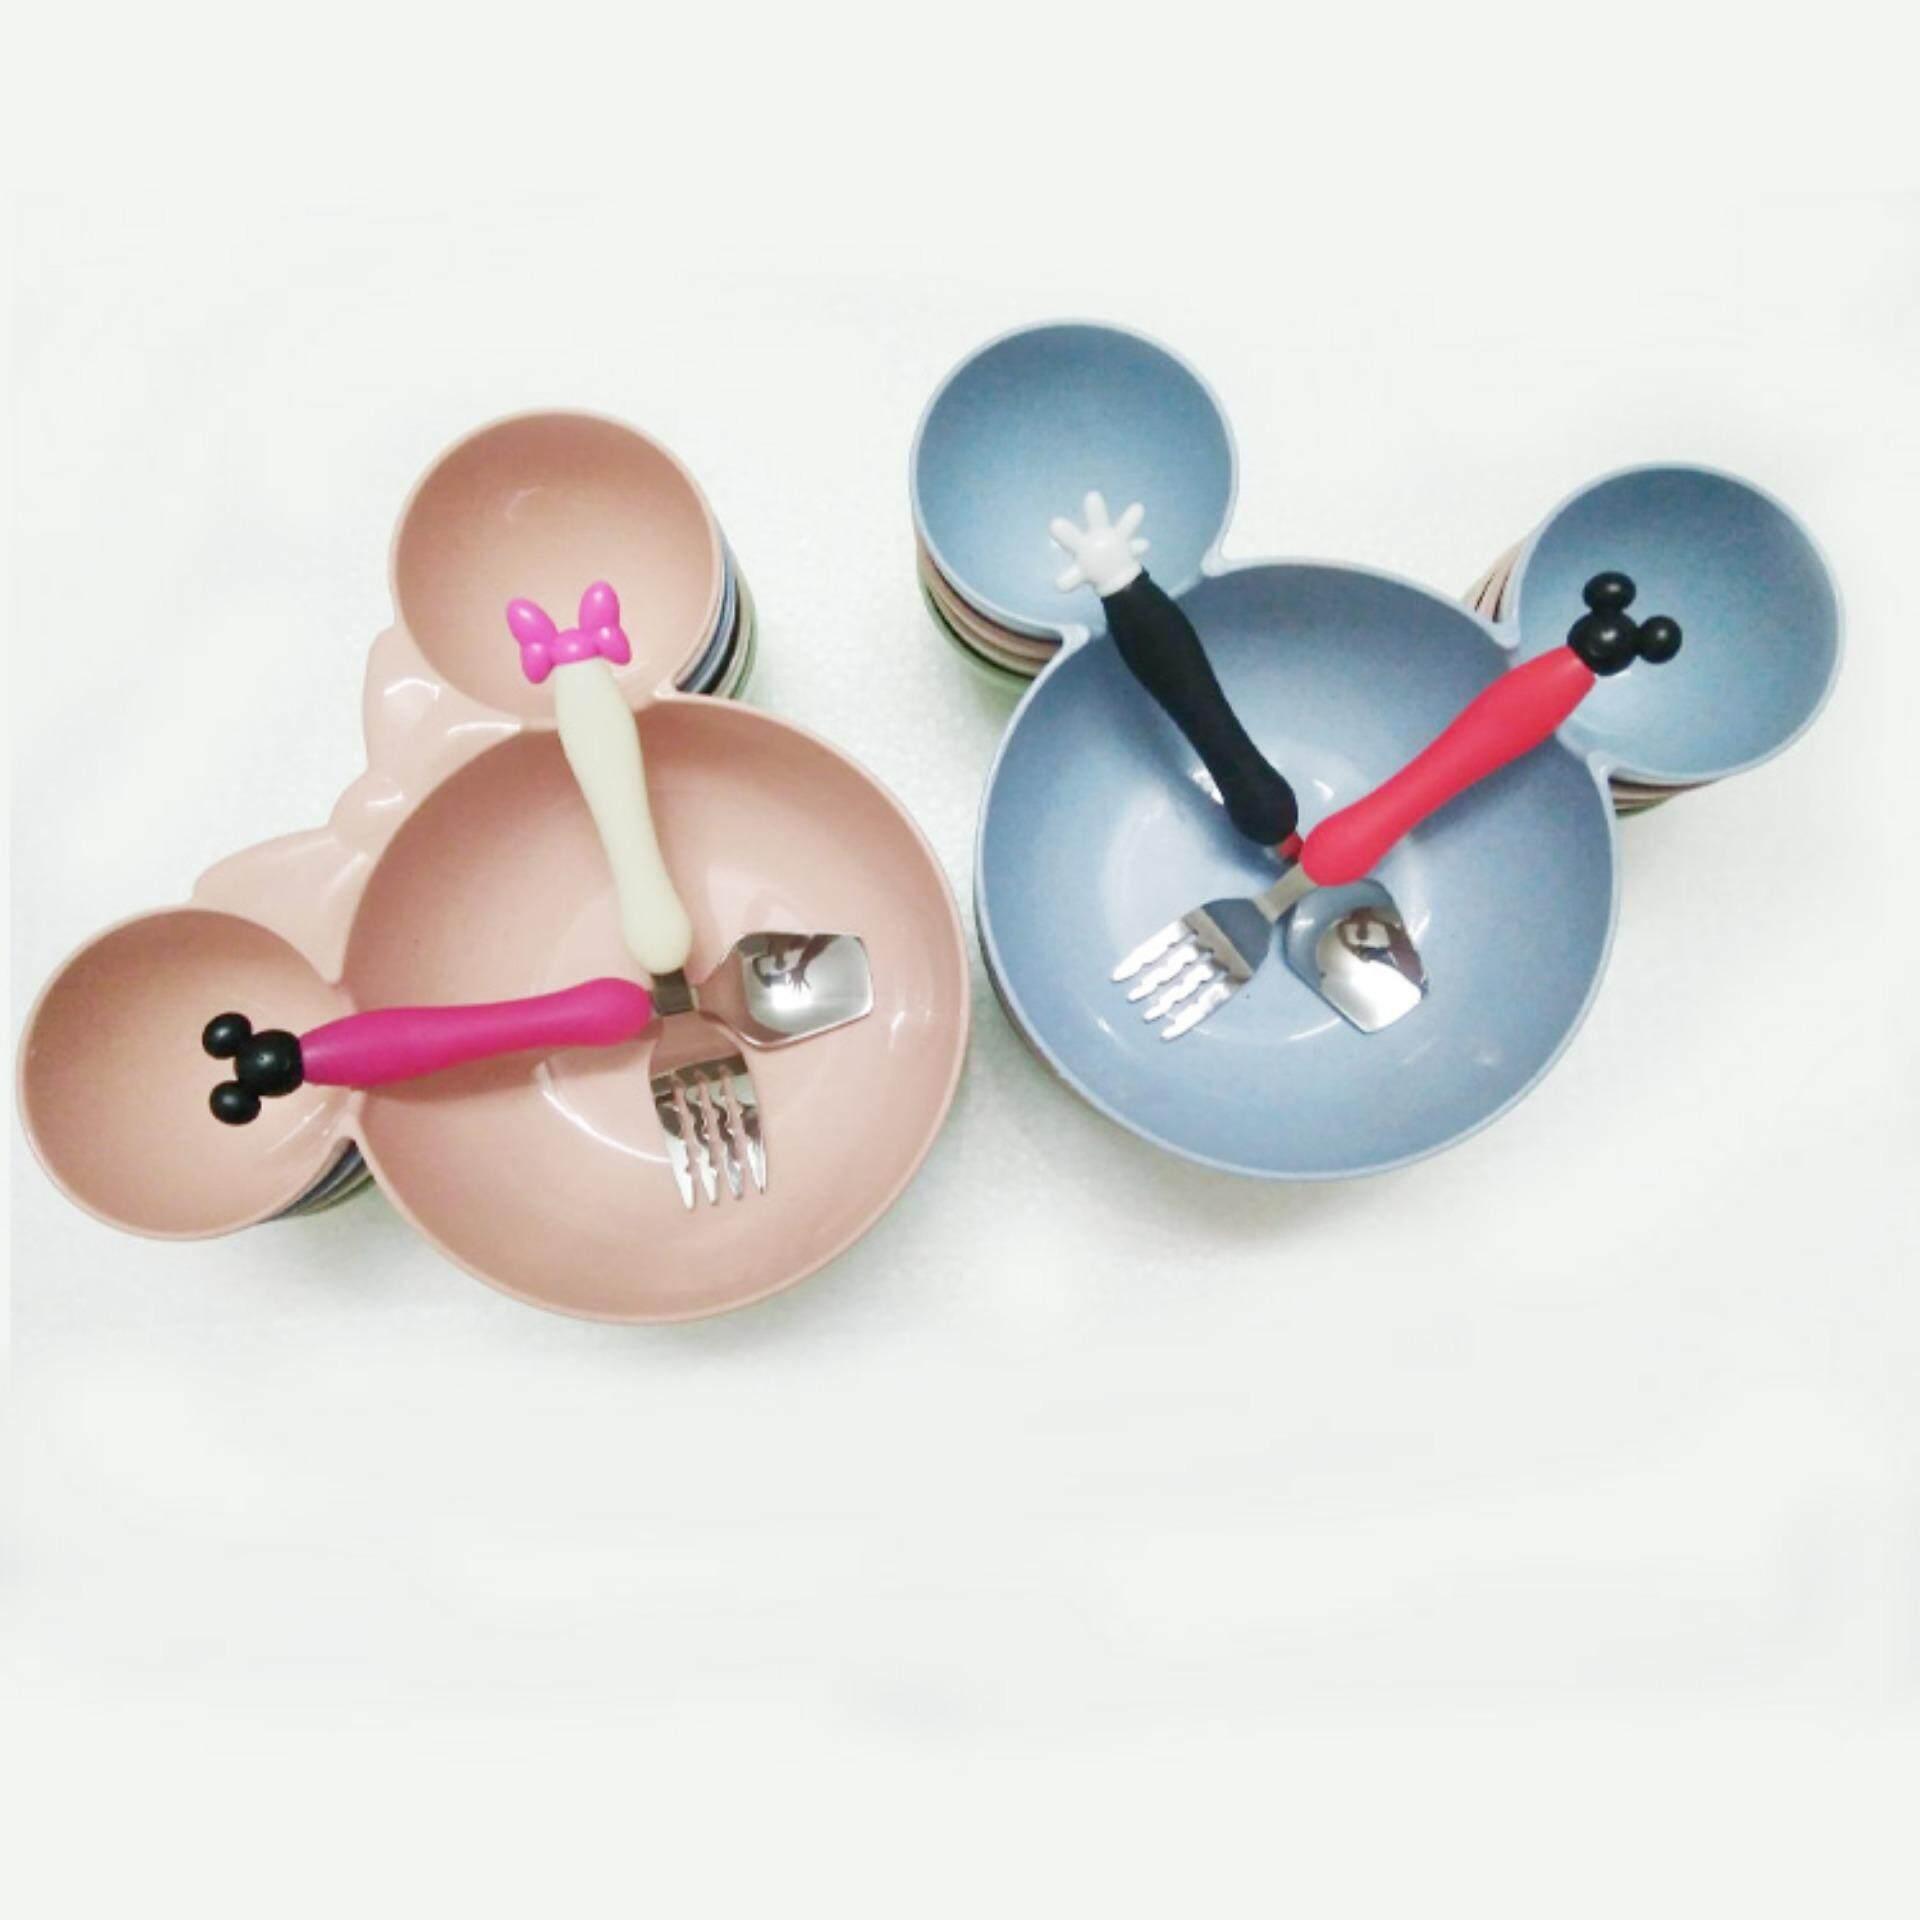 Mickey Design Bowl FOC SS spoon & fork